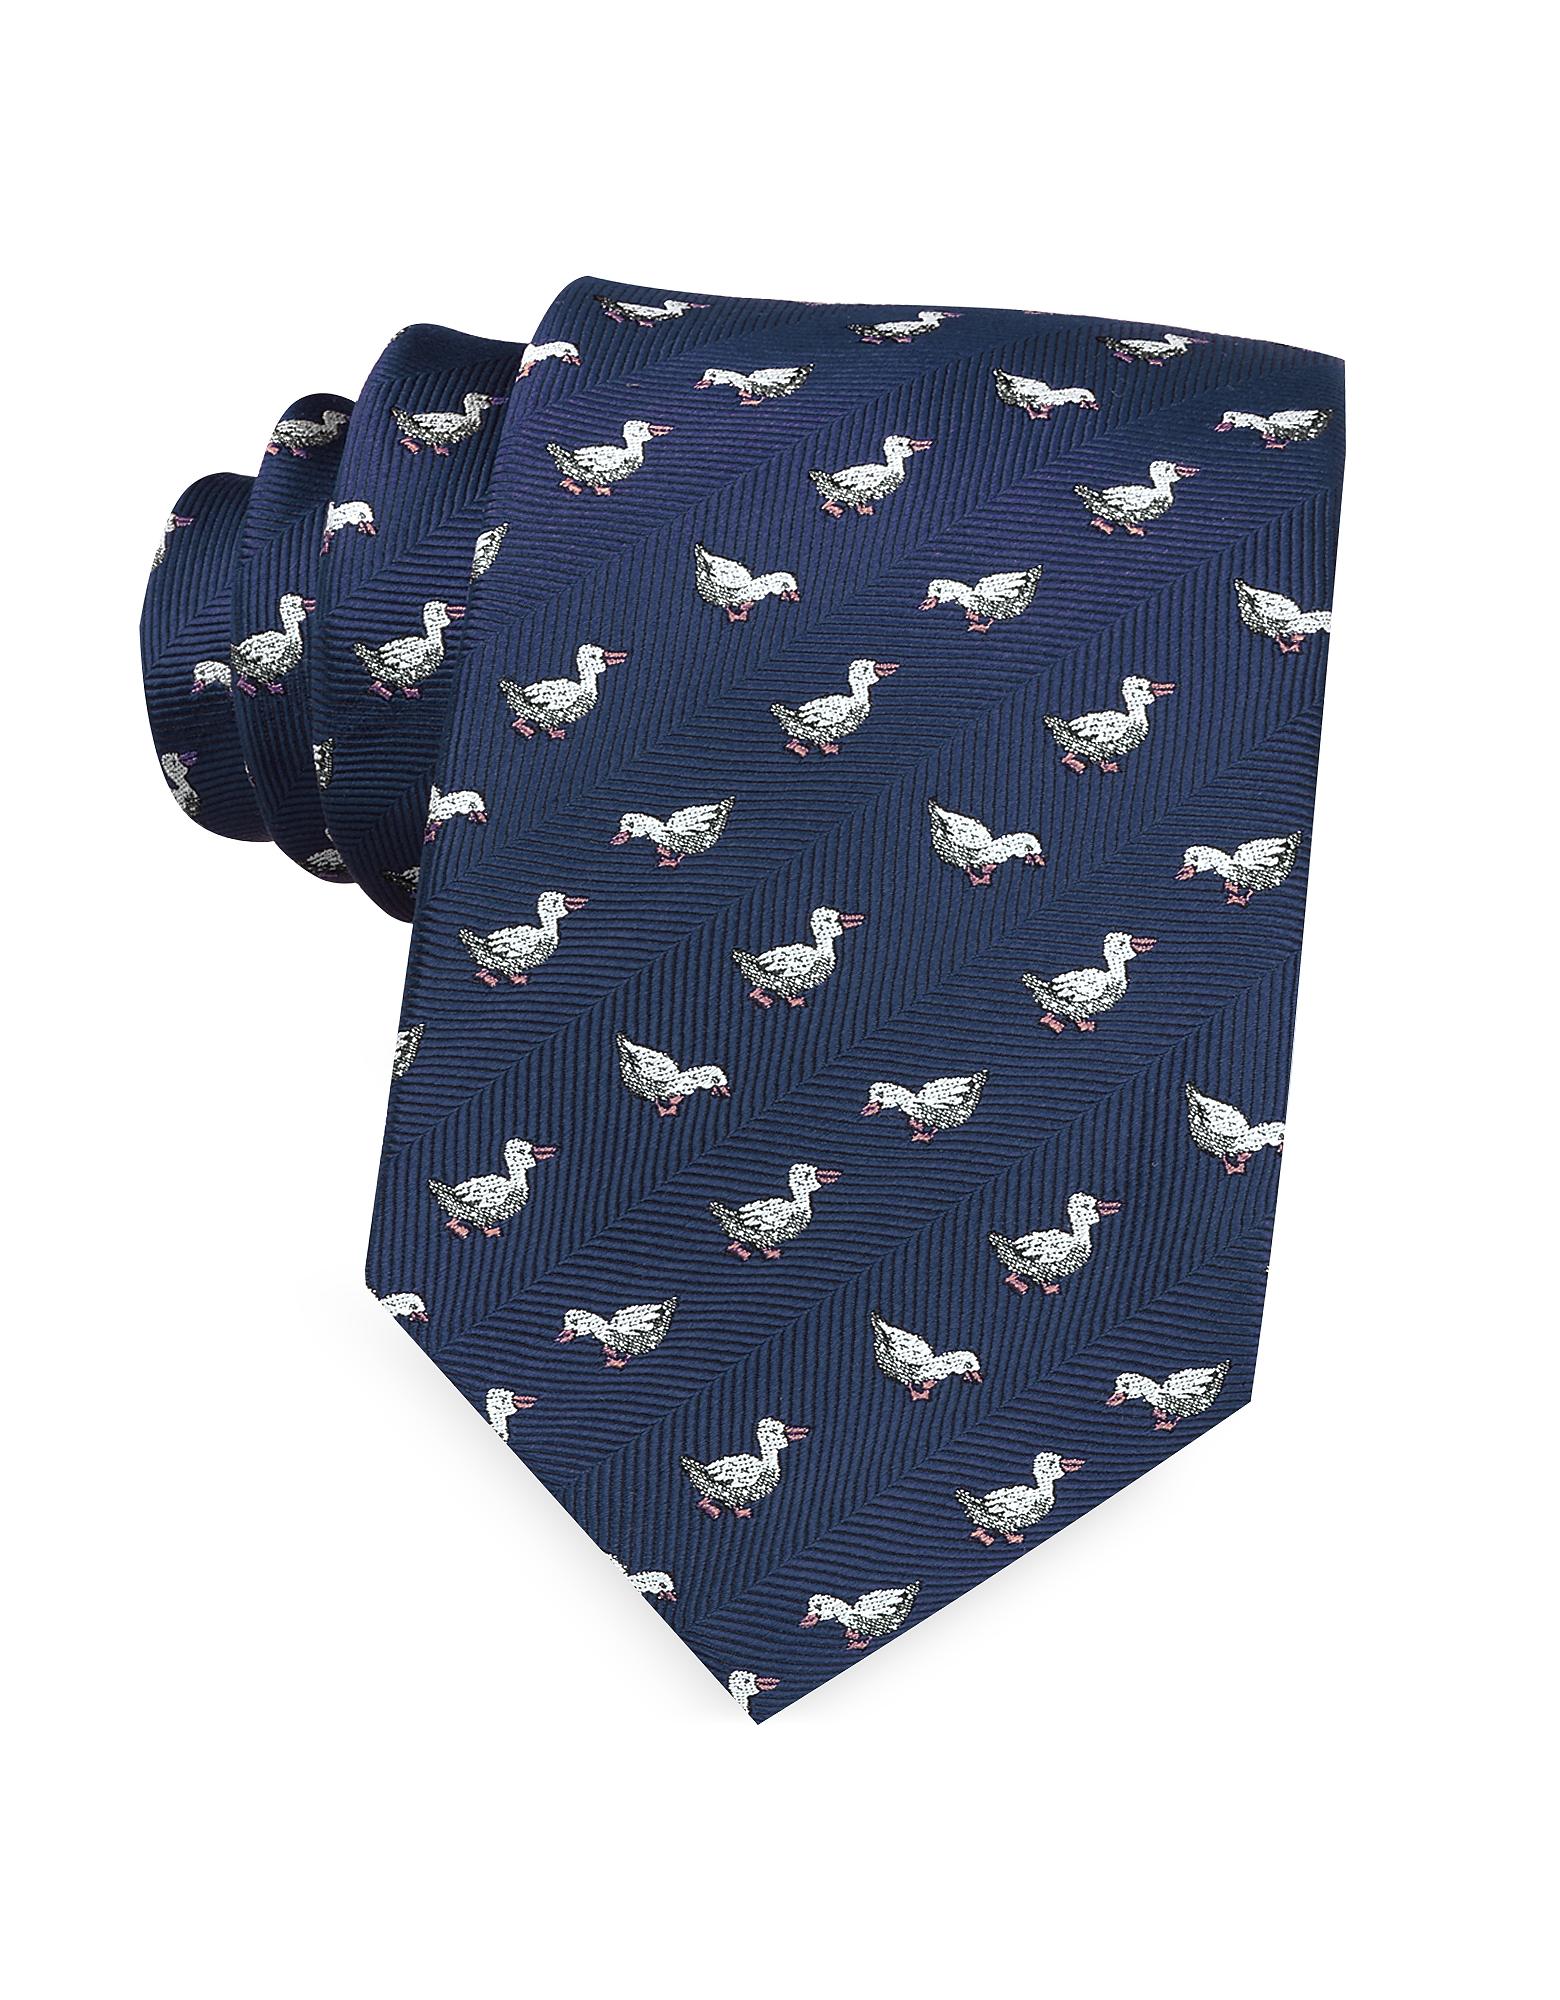 Marina D'Este Ties, White Duck Woven Silk Tie